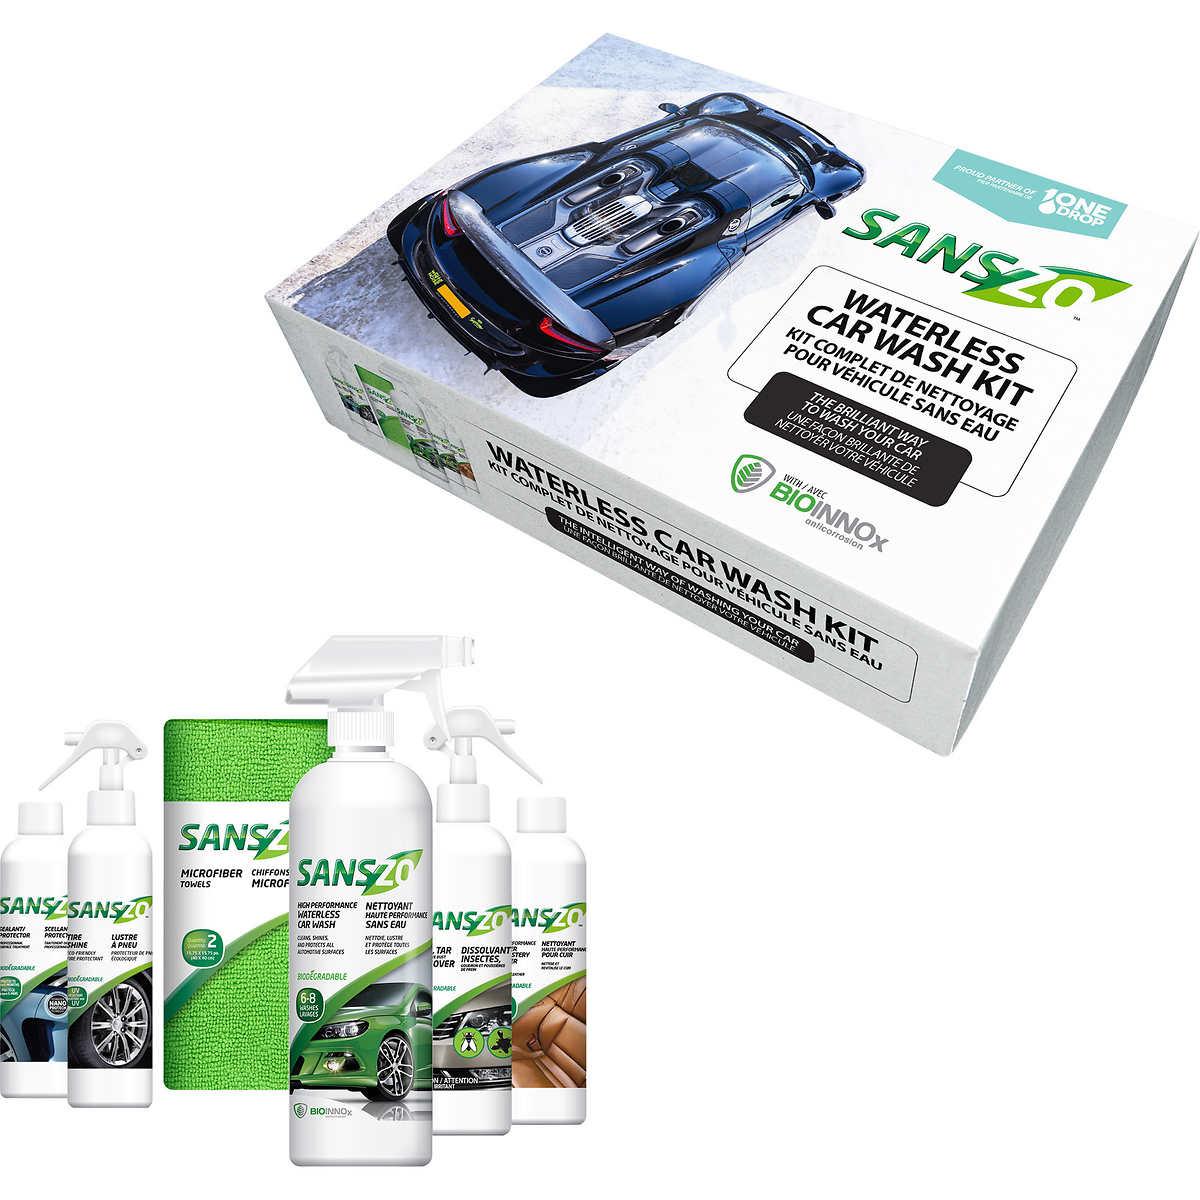 Sanszo high performance waterless car wash kit